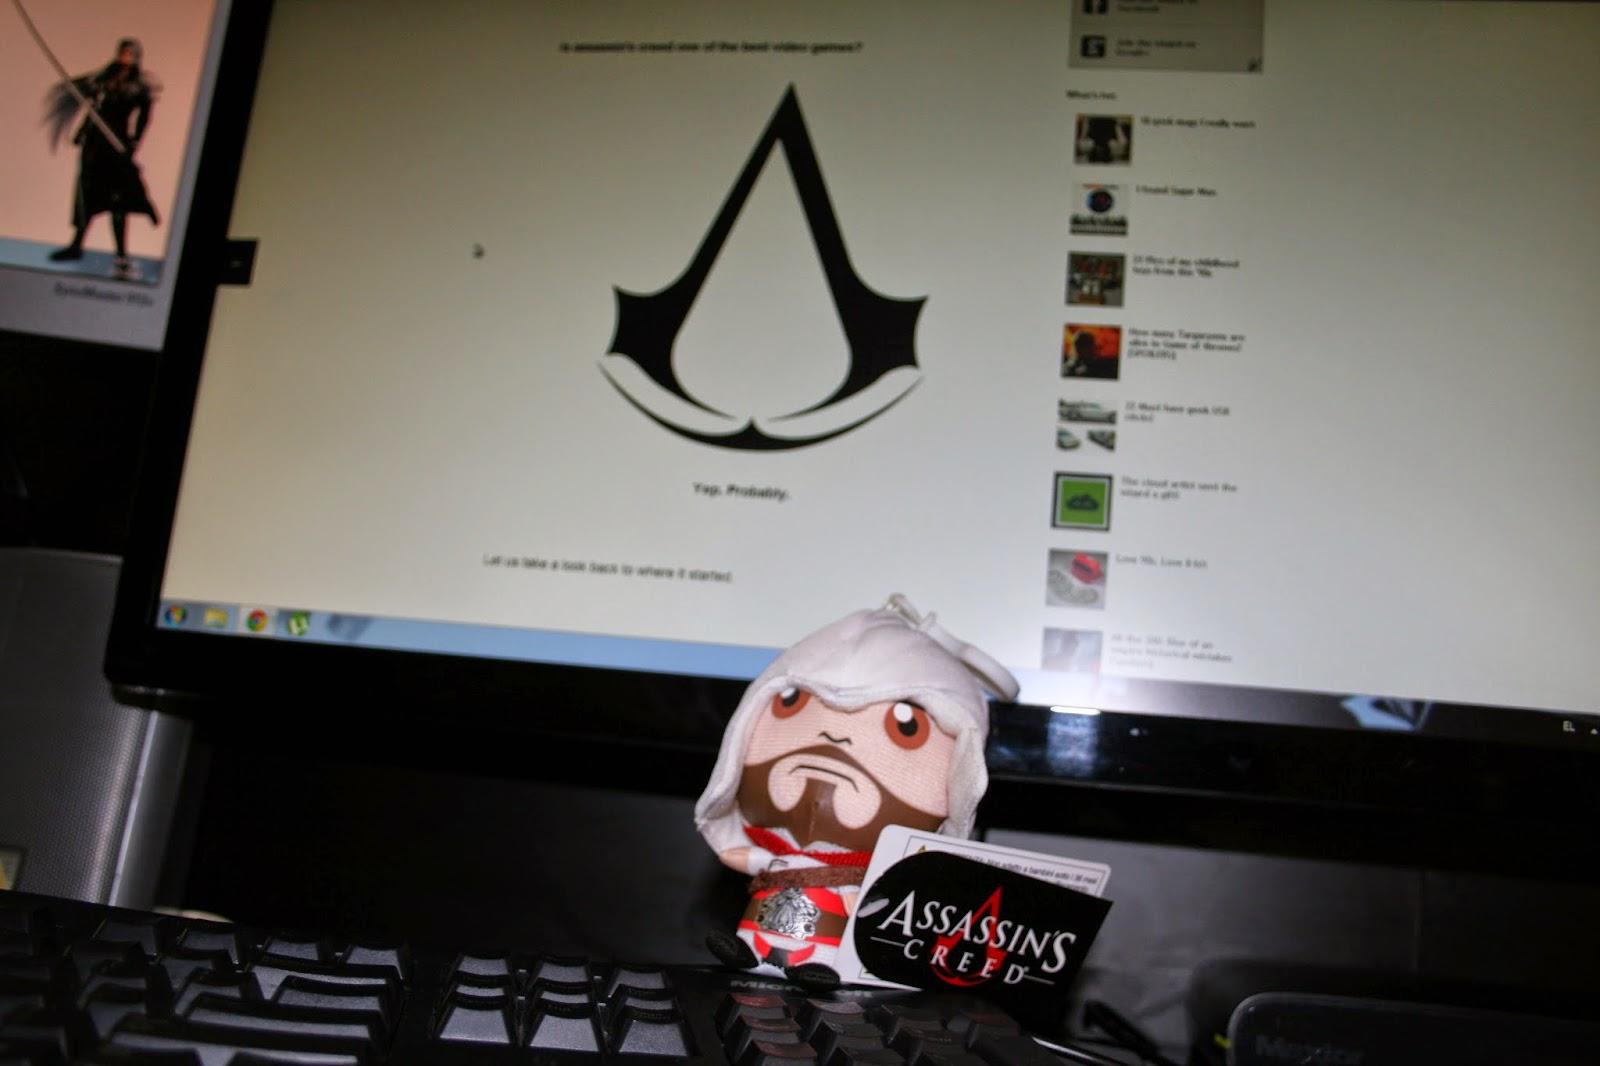 got a cute little assassins creed Ezio figure